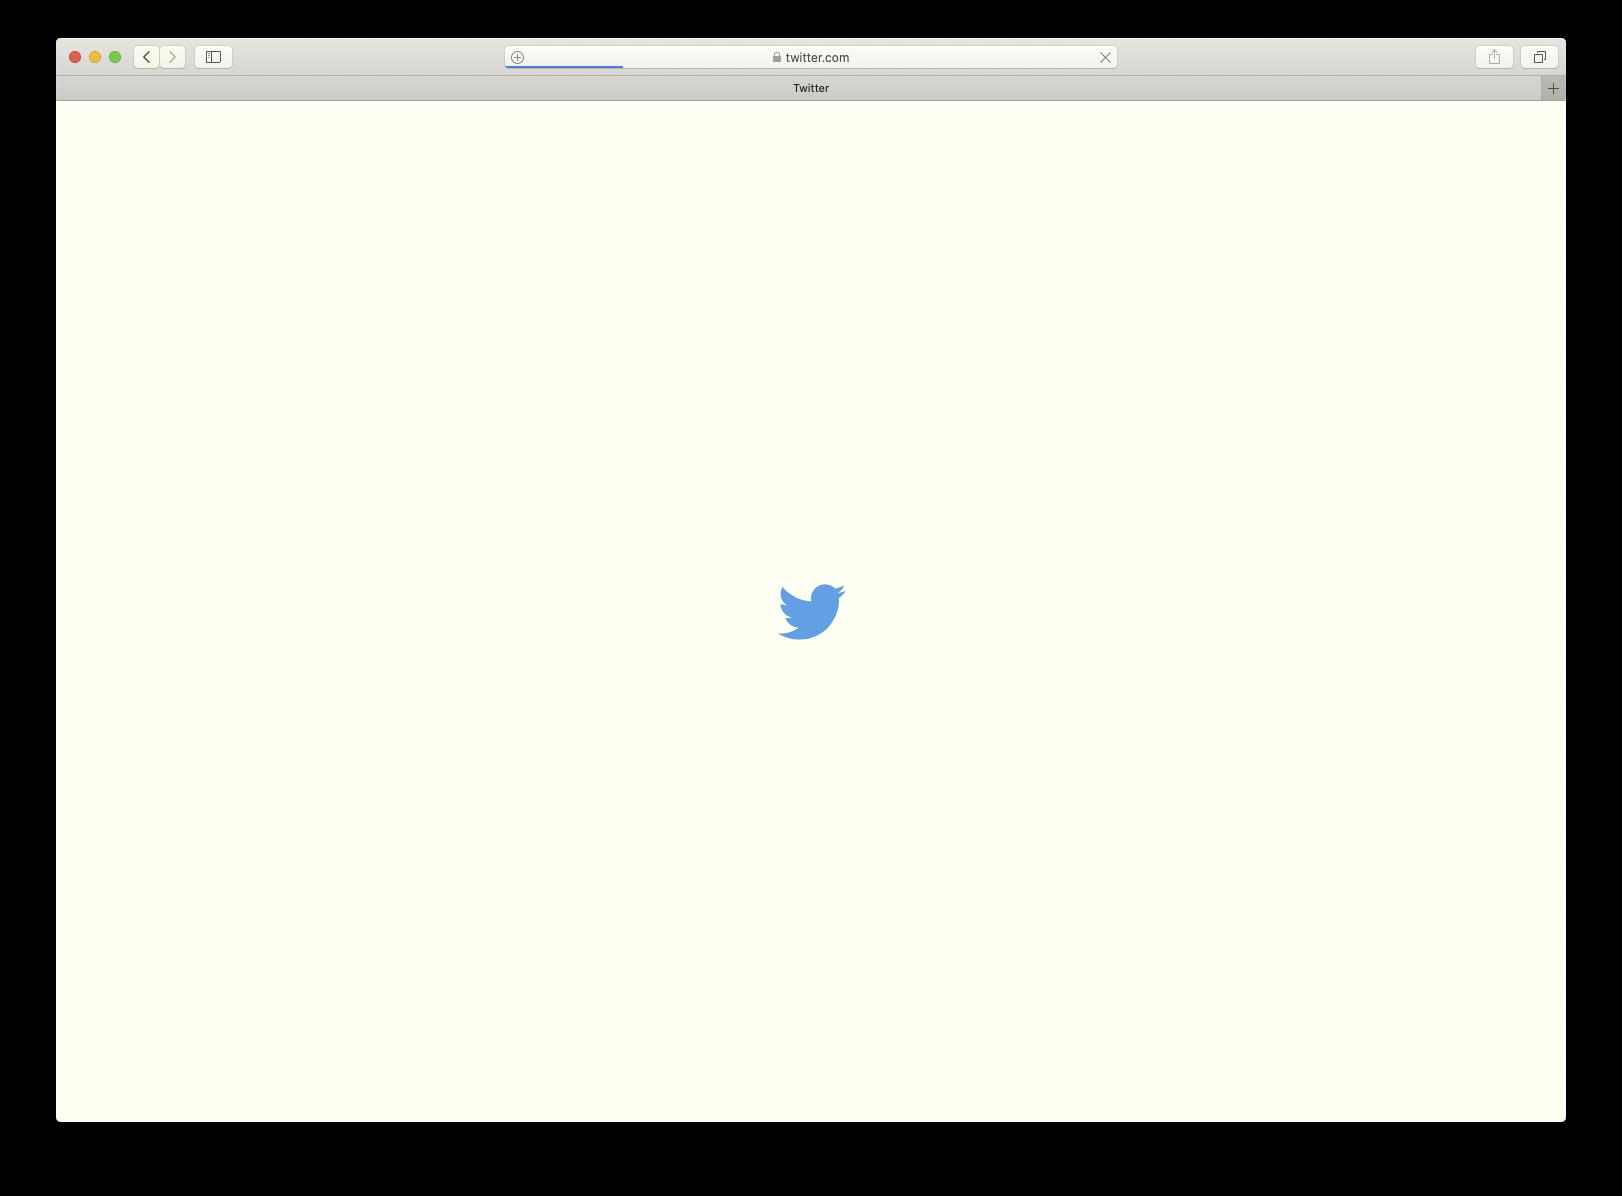 Mac Pro 2019 SafariのTwitter「だけ」異様に遅い